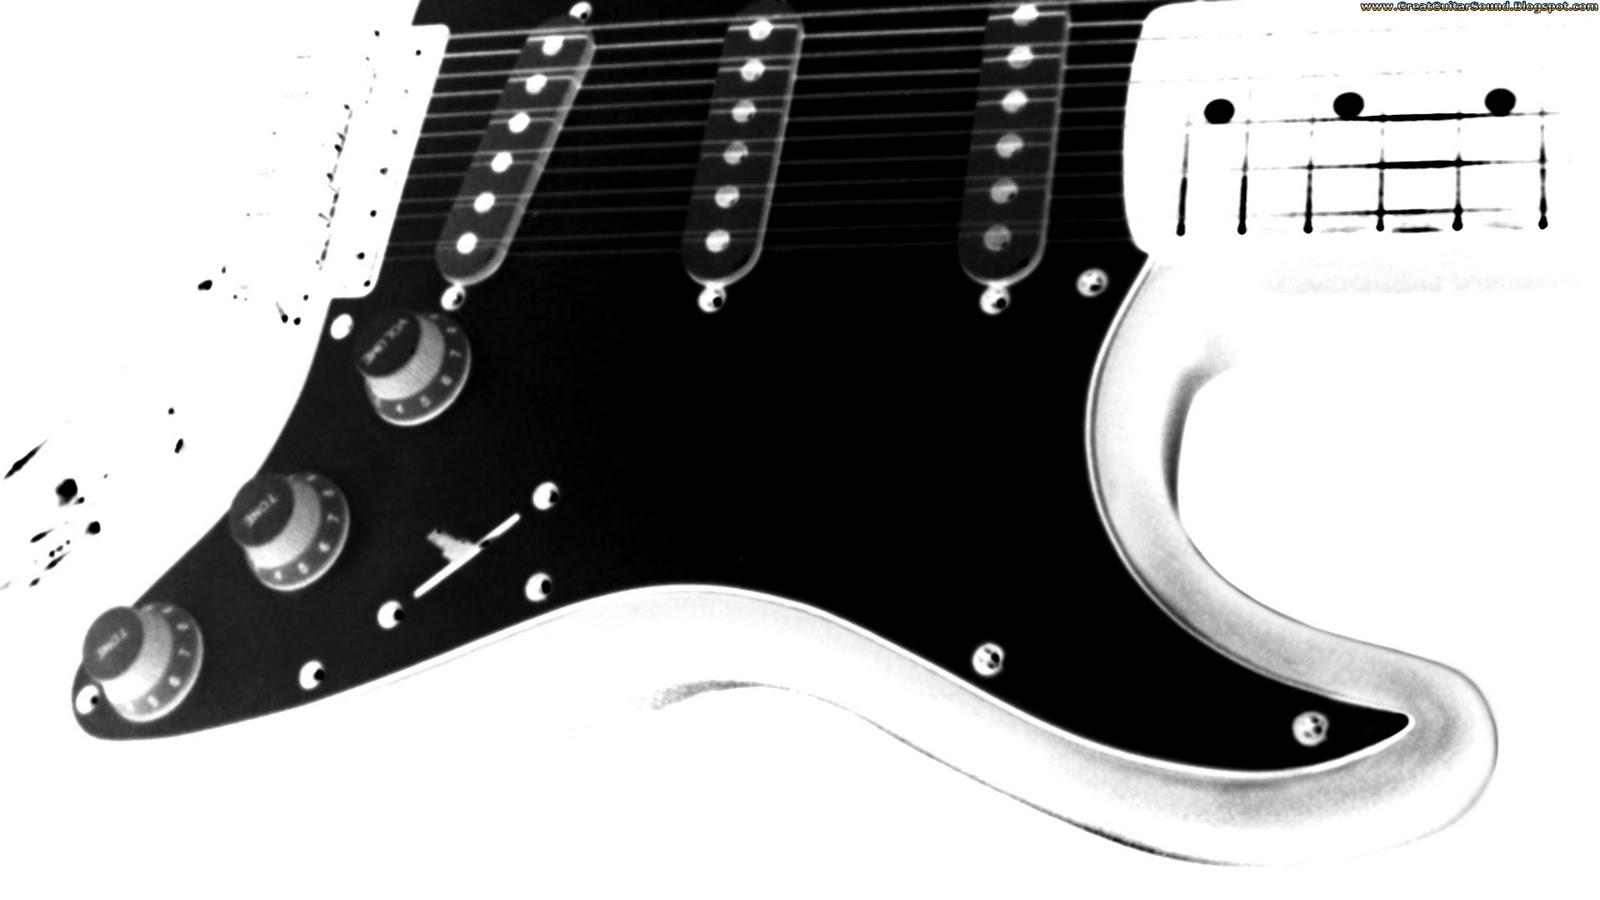 http://1.bp.blogspot.com/-Bq_WEOWRE08/Tpc6RwZPtTI/AAAAAAAAA7g/mIId3ONj-x0/s1600/White+And+Black+Fender+Stratocaster+Electric+Guitar+Black+Pickguard+Background+HD+Guitar+Music+Desktop+Wallpaper+1920x1080+www.GreatGuitarSound.Blogspot.com.jpg